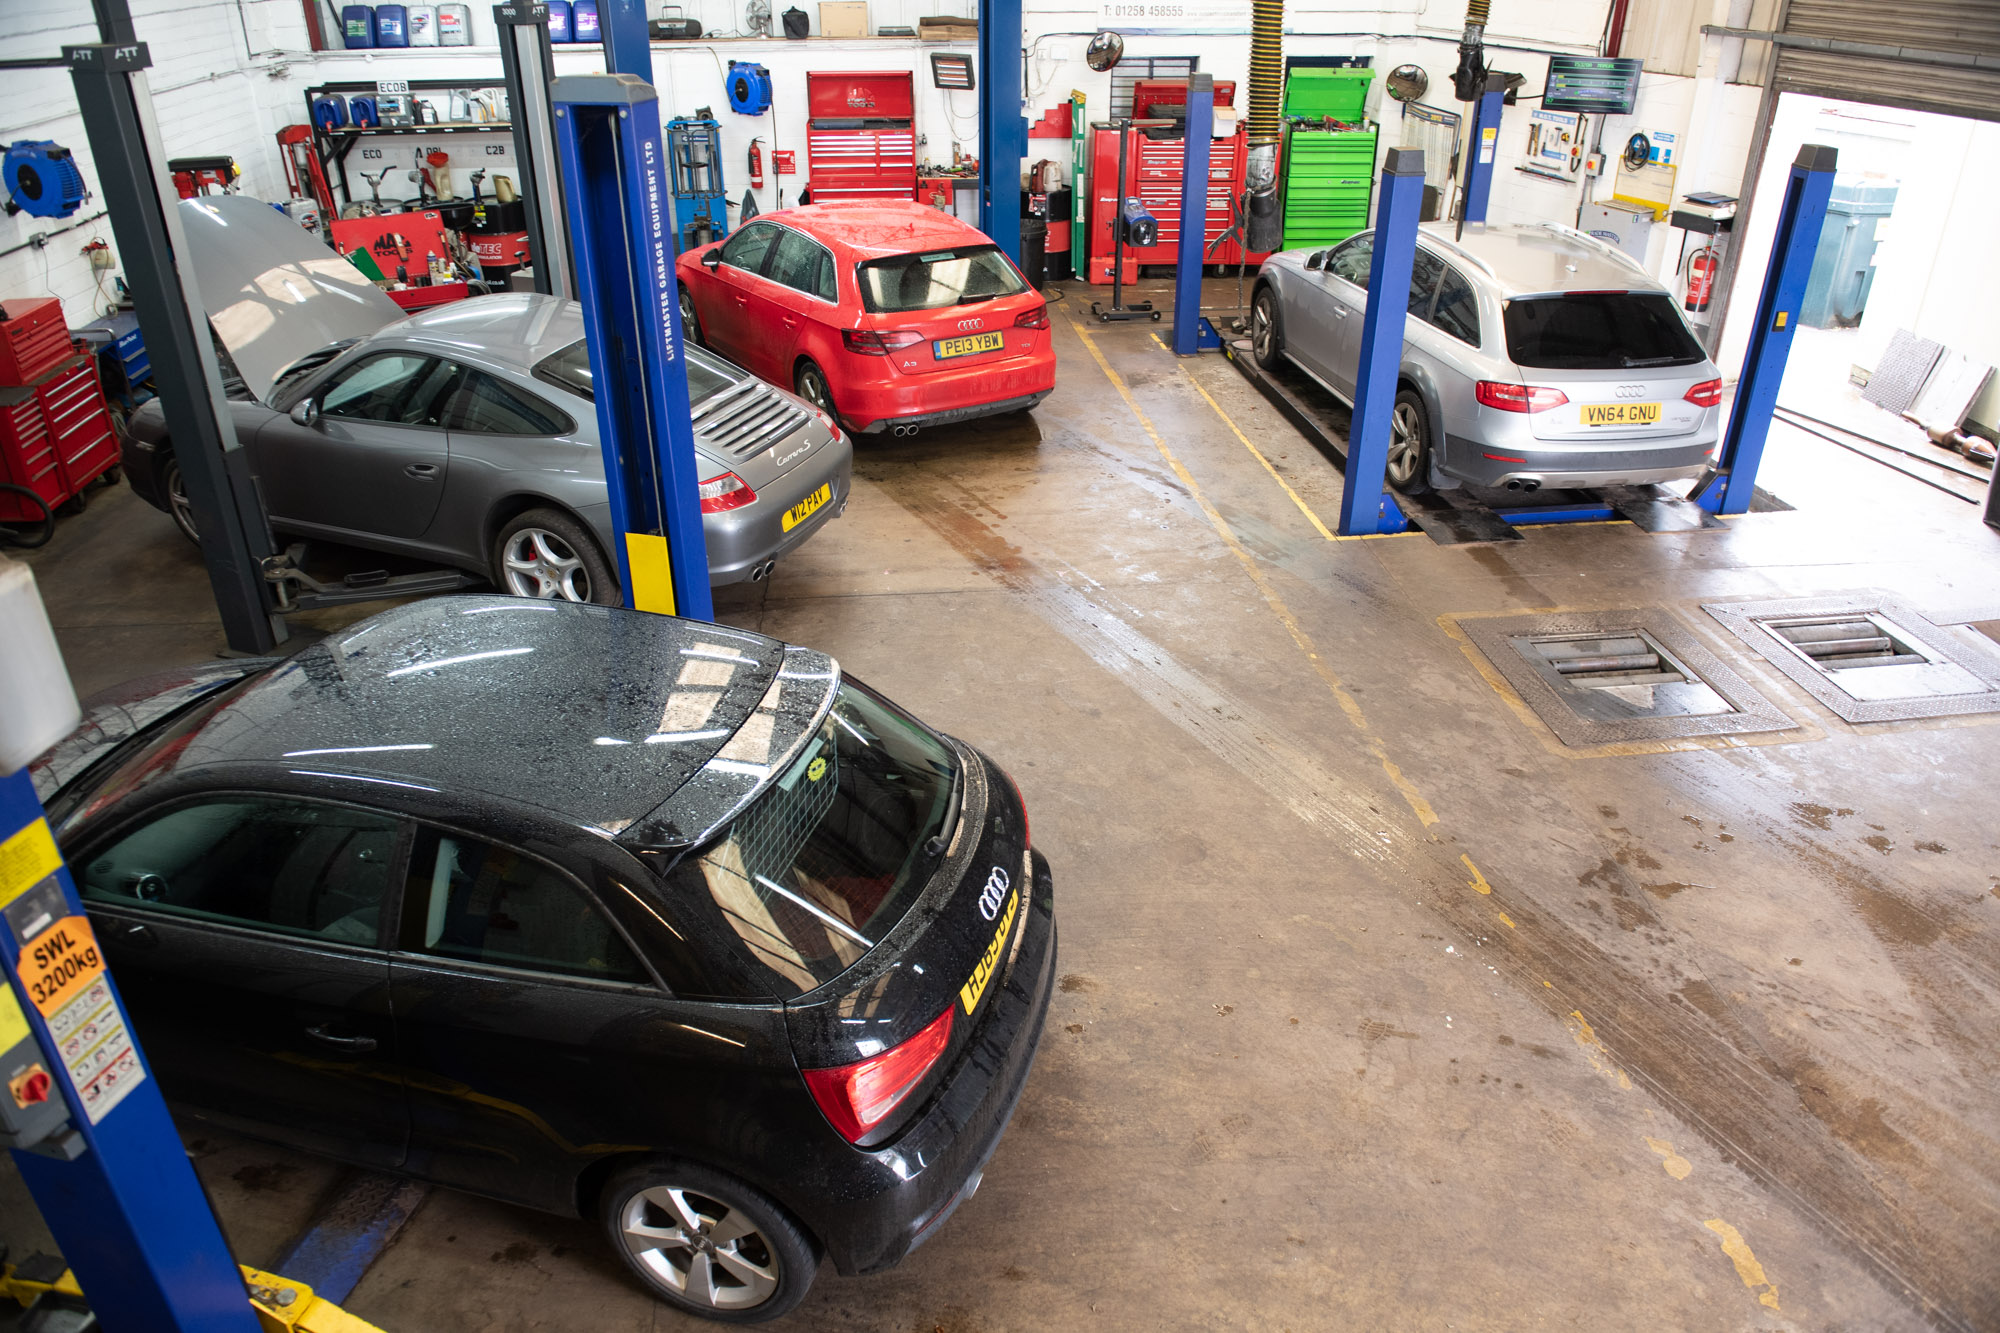 Autotechnics Blandford - Bosch Car Service Centre